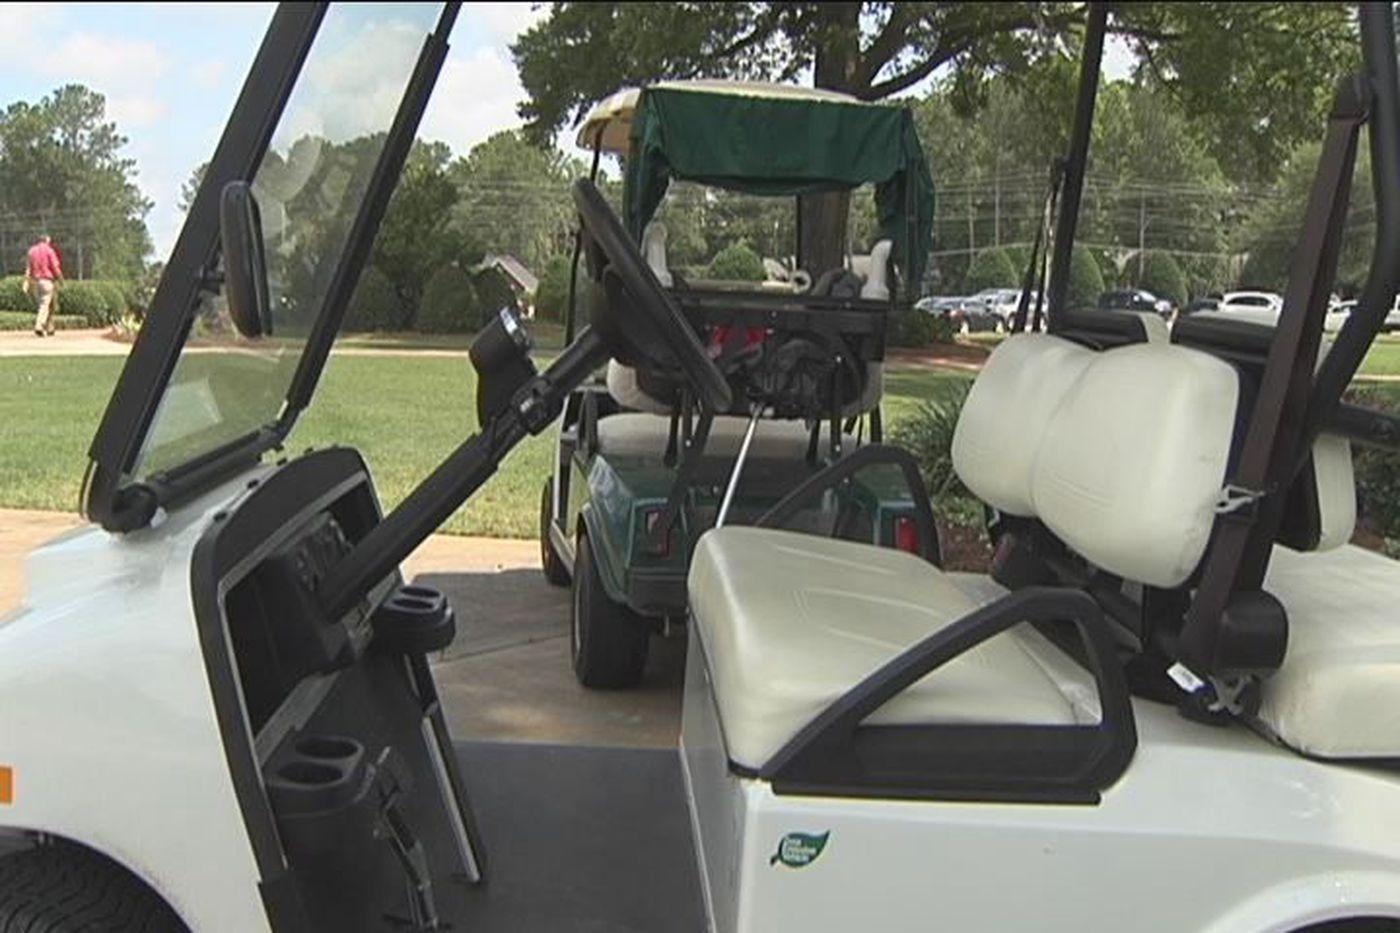 DCP hears golf cart complaints on street signs, street atv, street go cart, harley carts, street shoes, custom ezgo industrial carts, cricket carts,